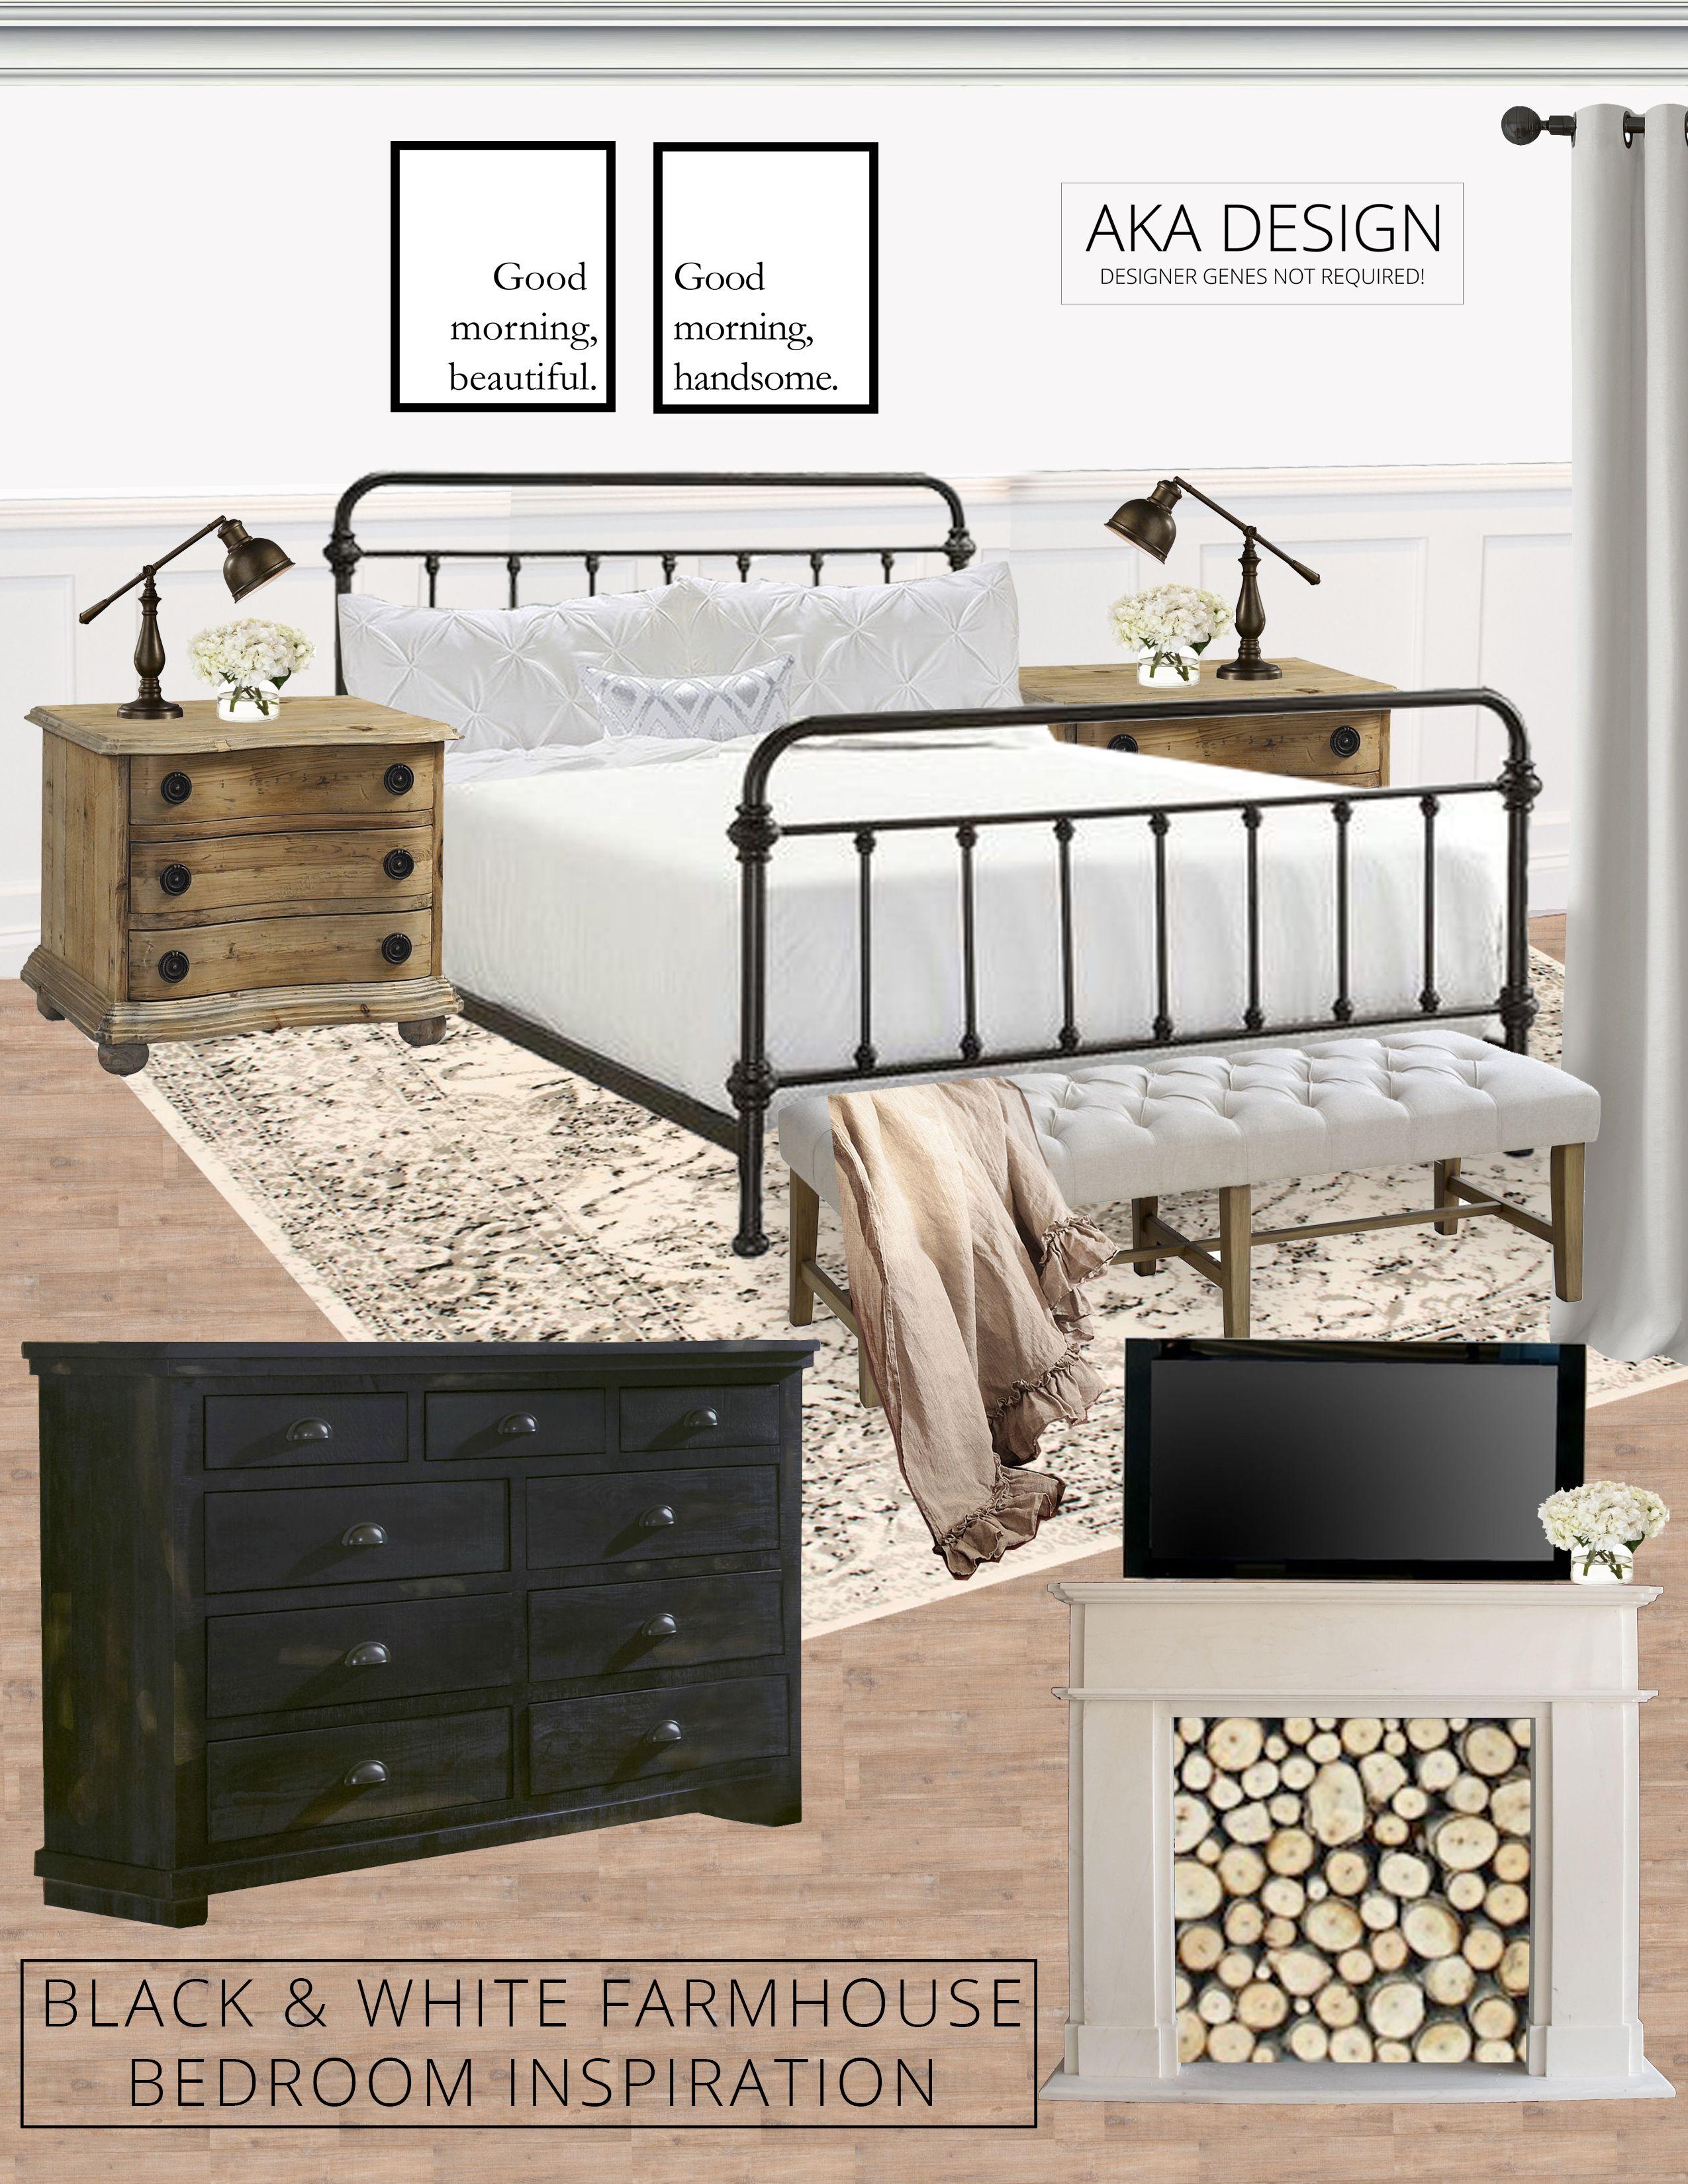 38+ Black and white farmhouse bedroom ideas info